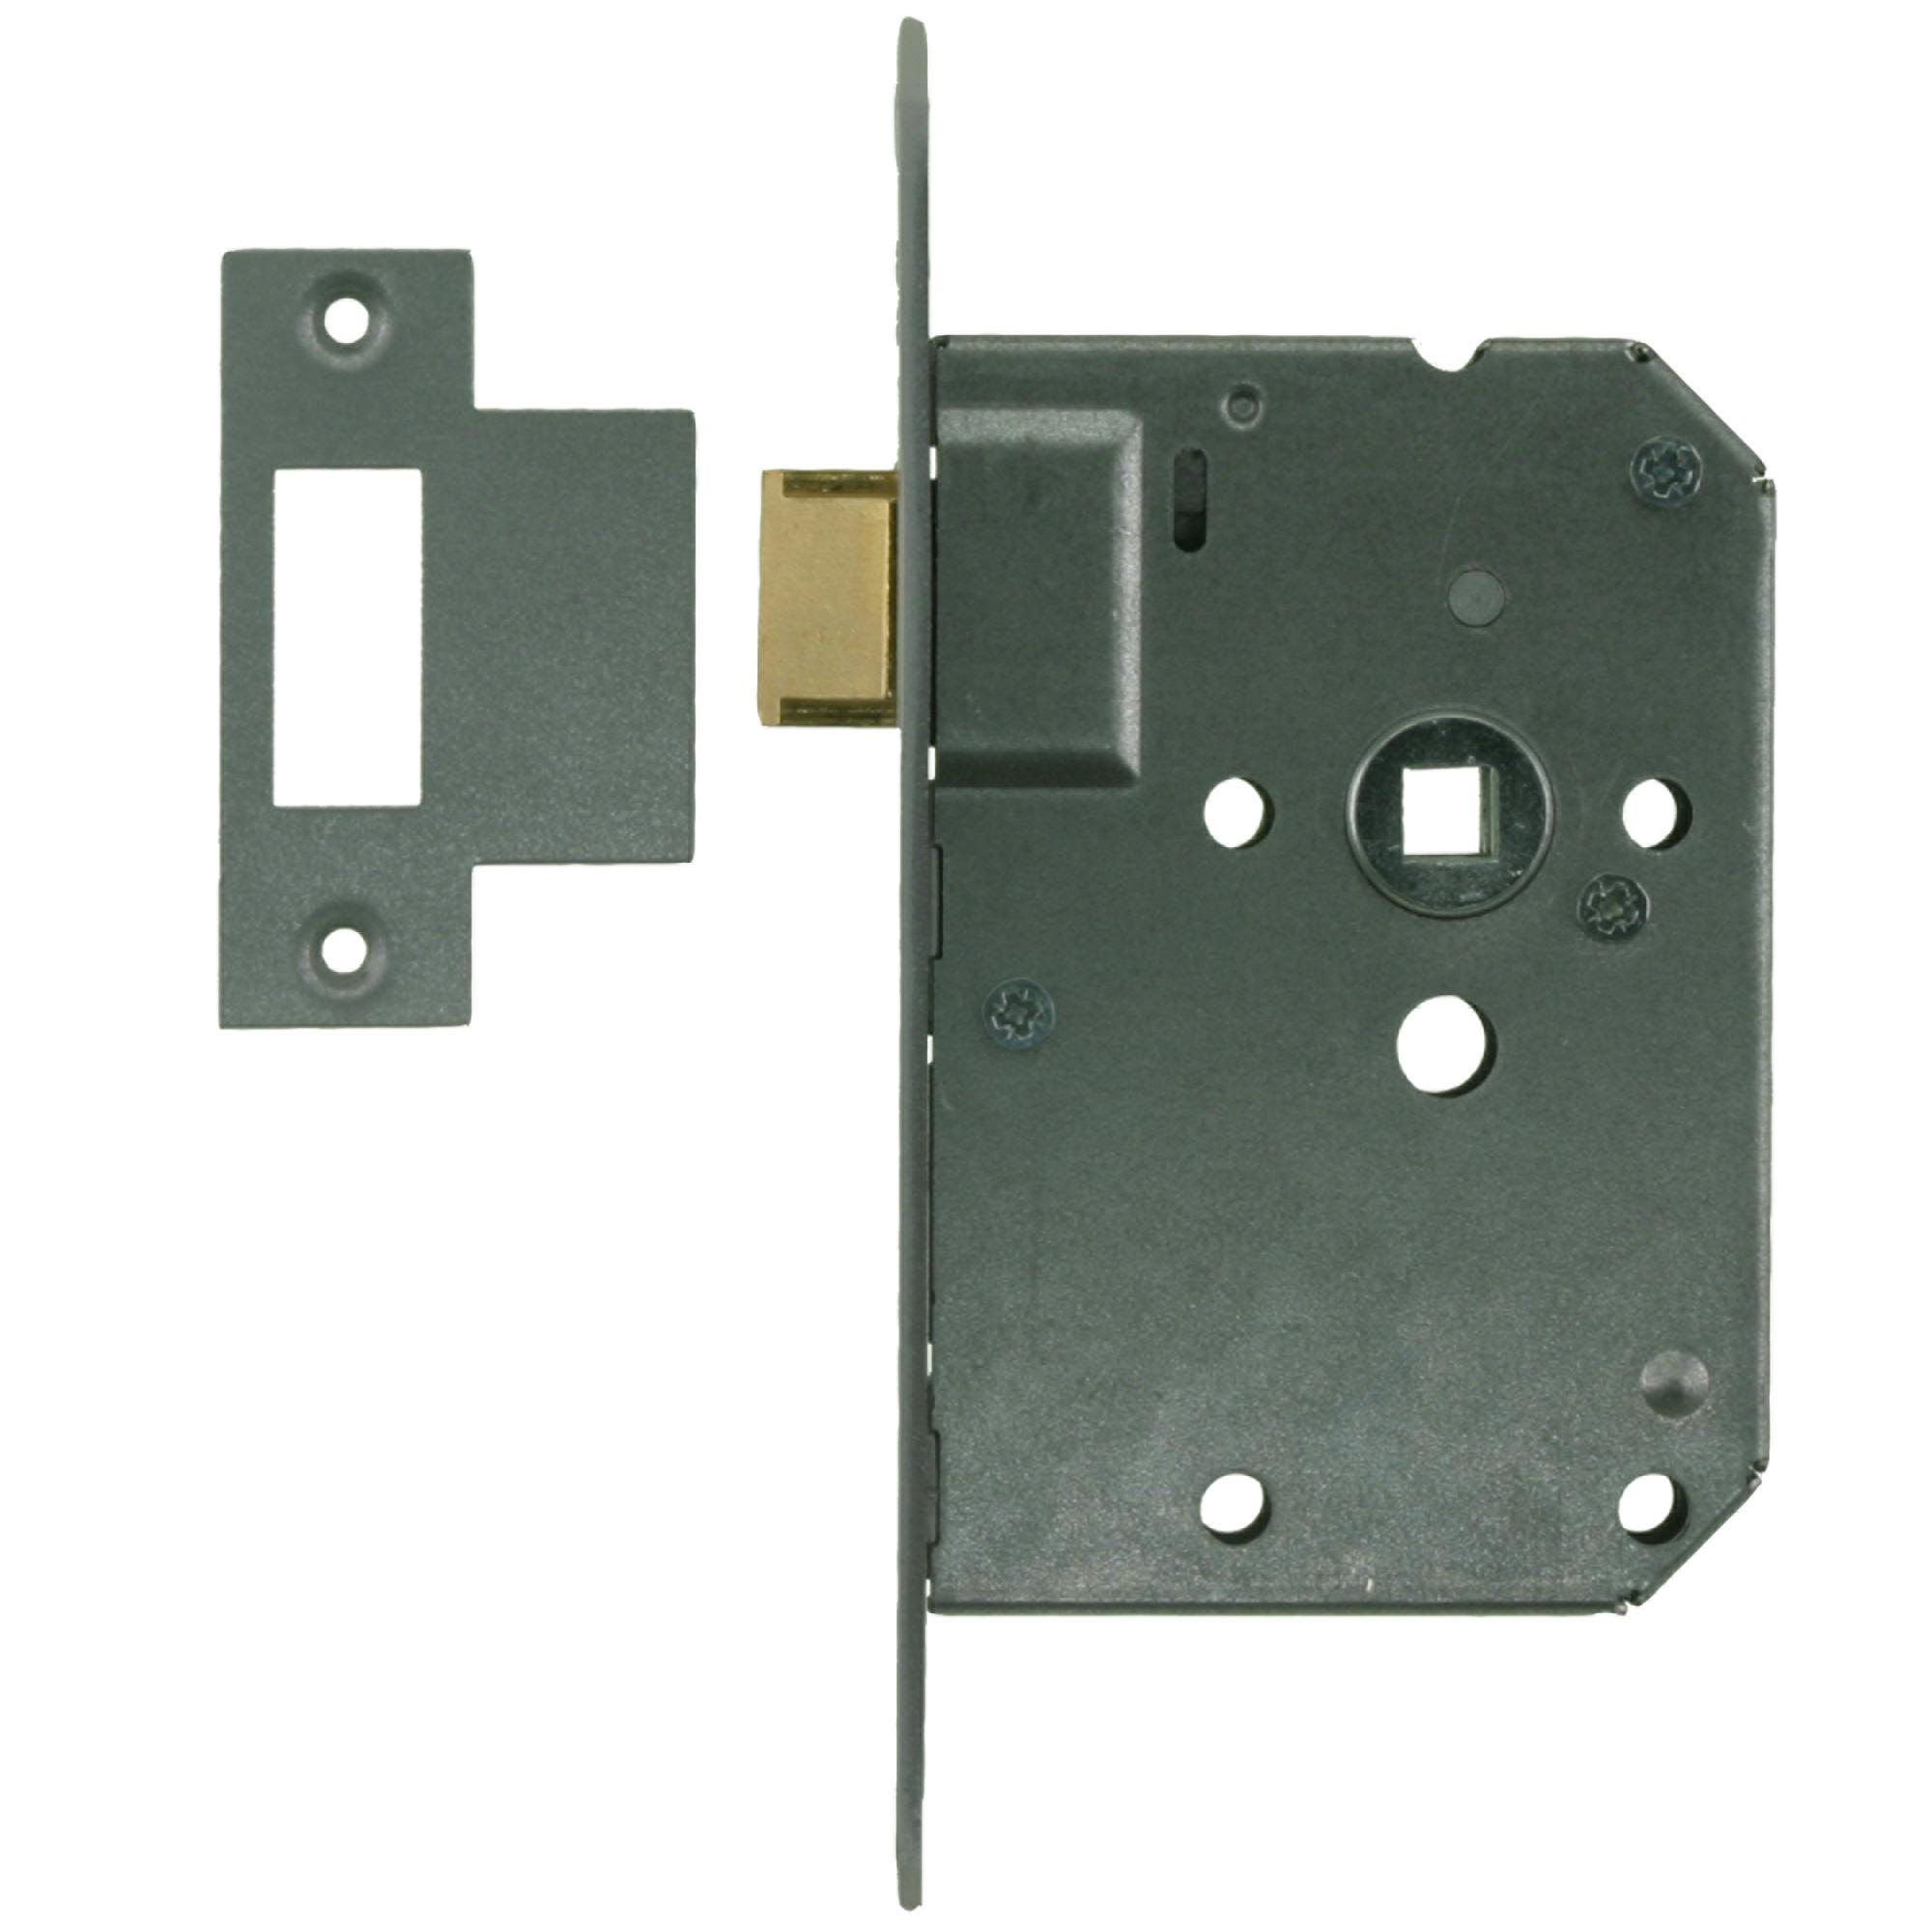 Nemef slot zb 1255-2-50